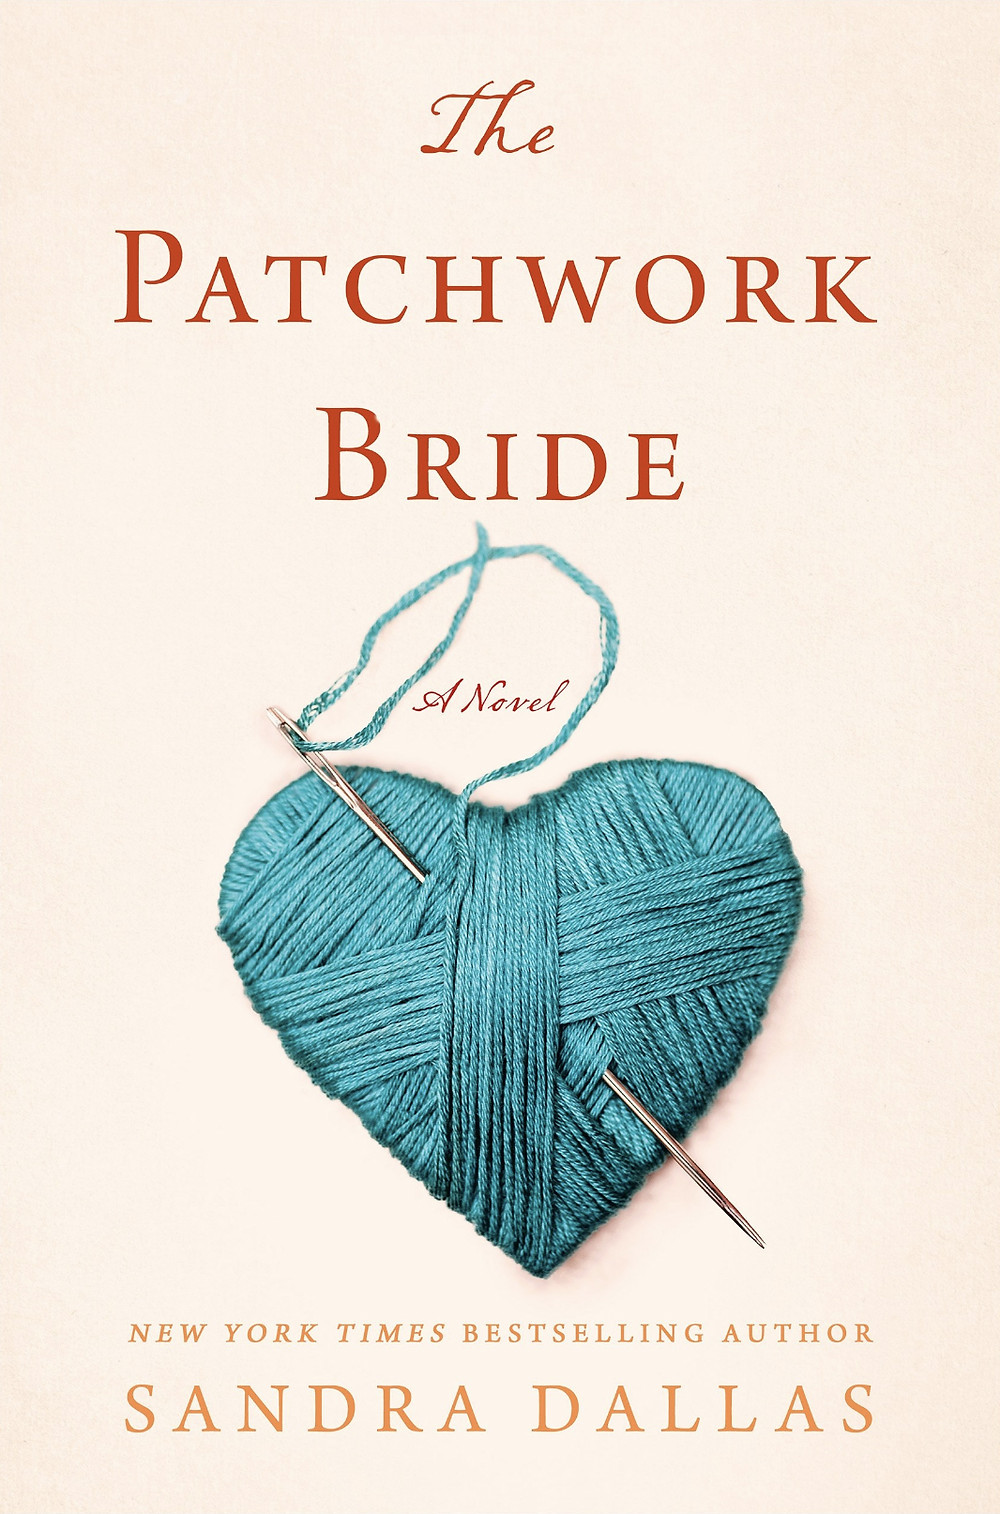 Patchwork Bride book by Sandra Dallas